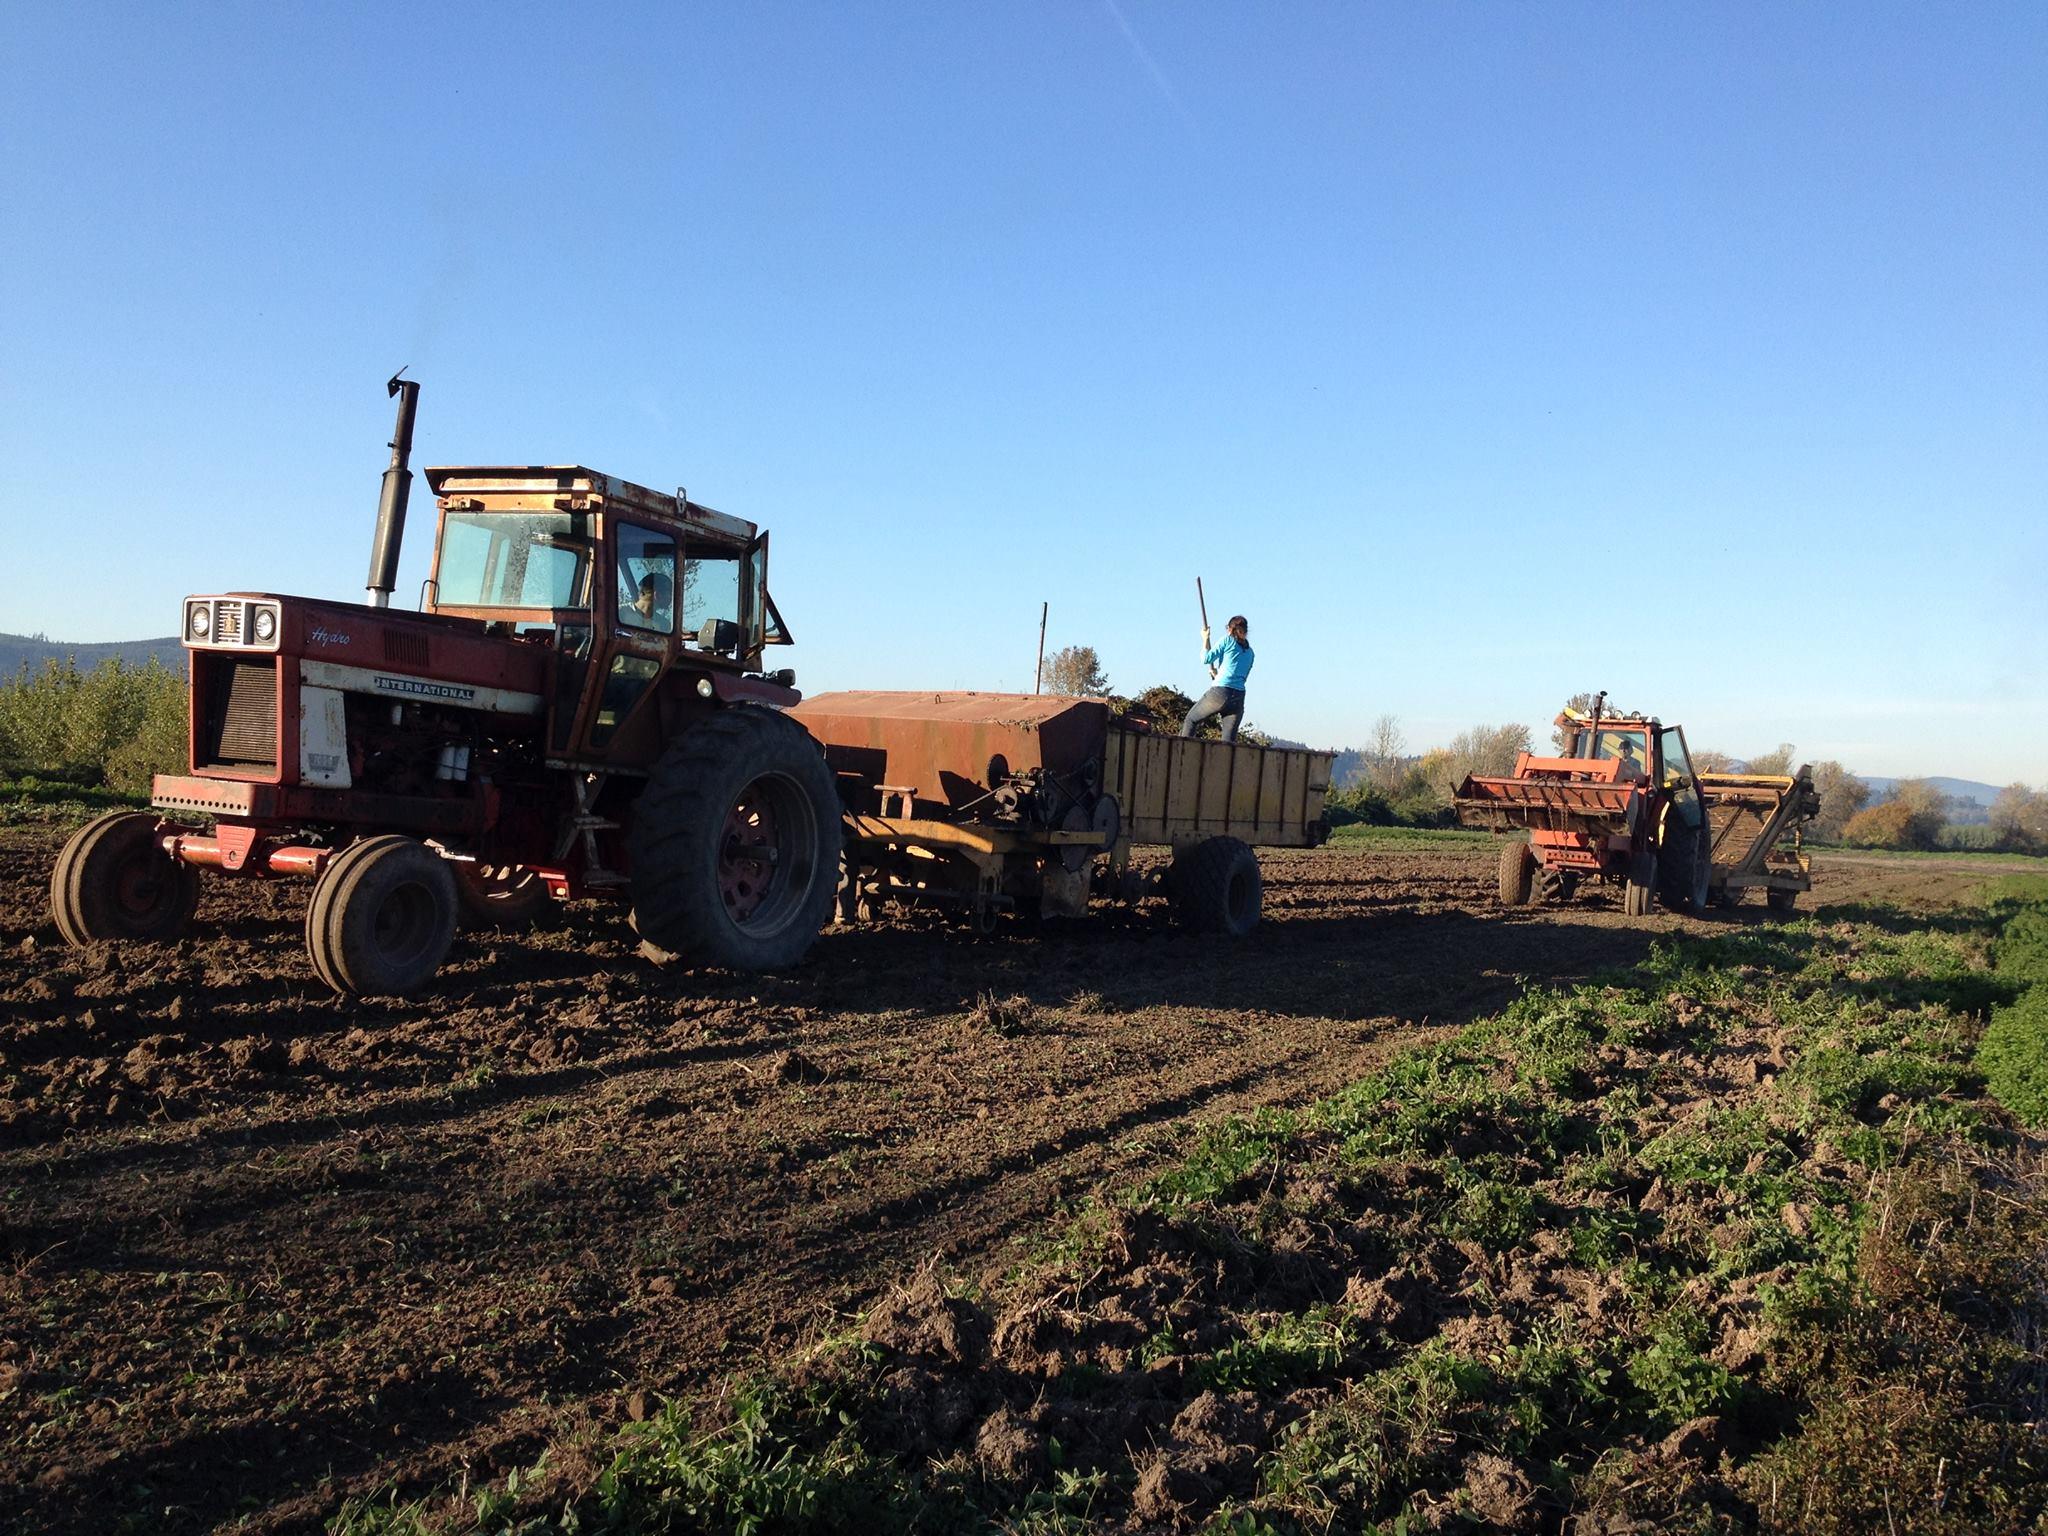 Teamwork at Seely Mint's Farm